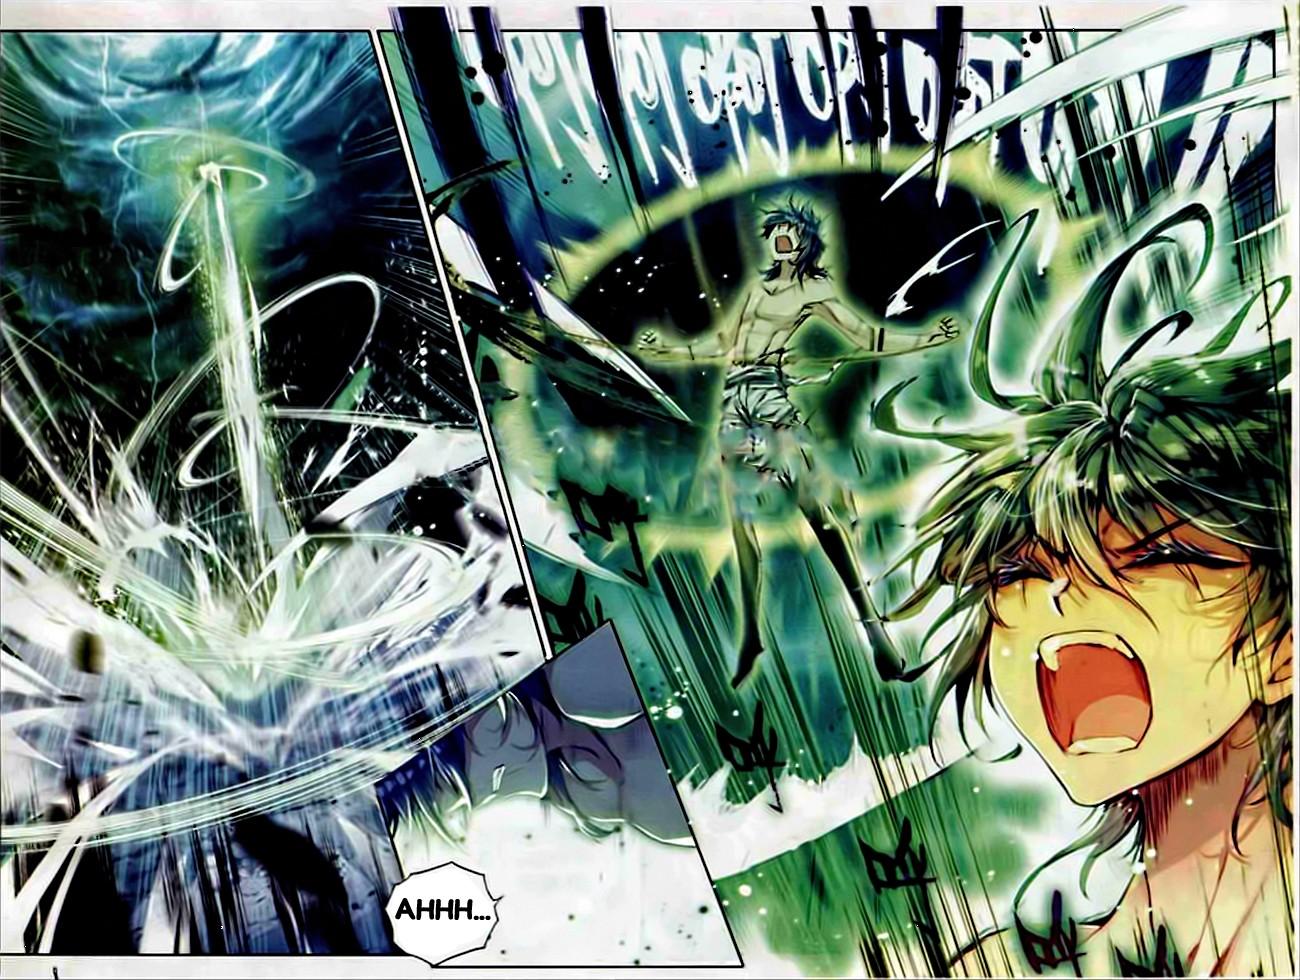 http://c5.ninemanga.com/es_manga/33/16417/429838/18ec36fca13a7aff8319d2abed7bea48.jpg Page 9